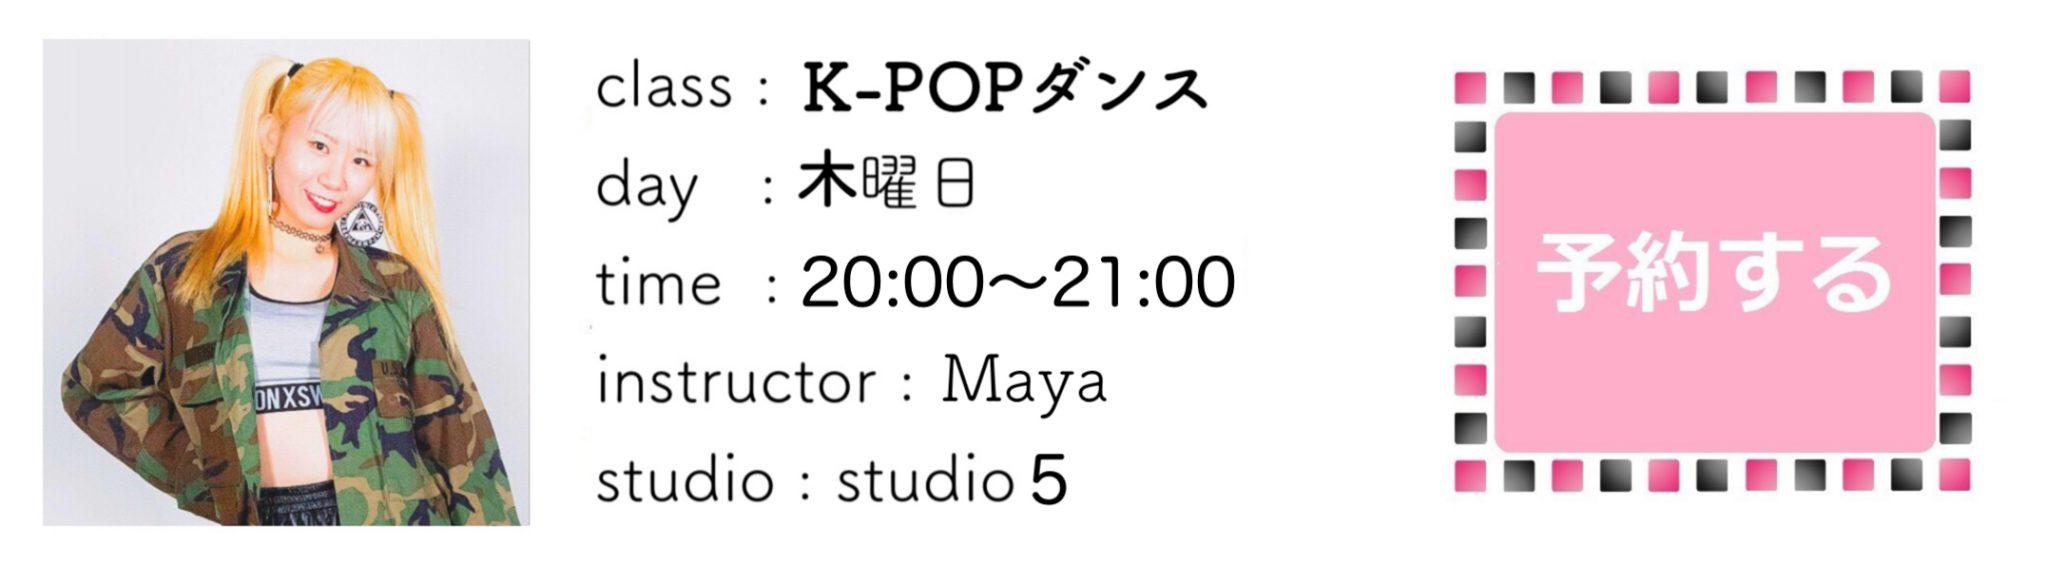 K-POPダンス(木曜日20:00) フリーパス予約